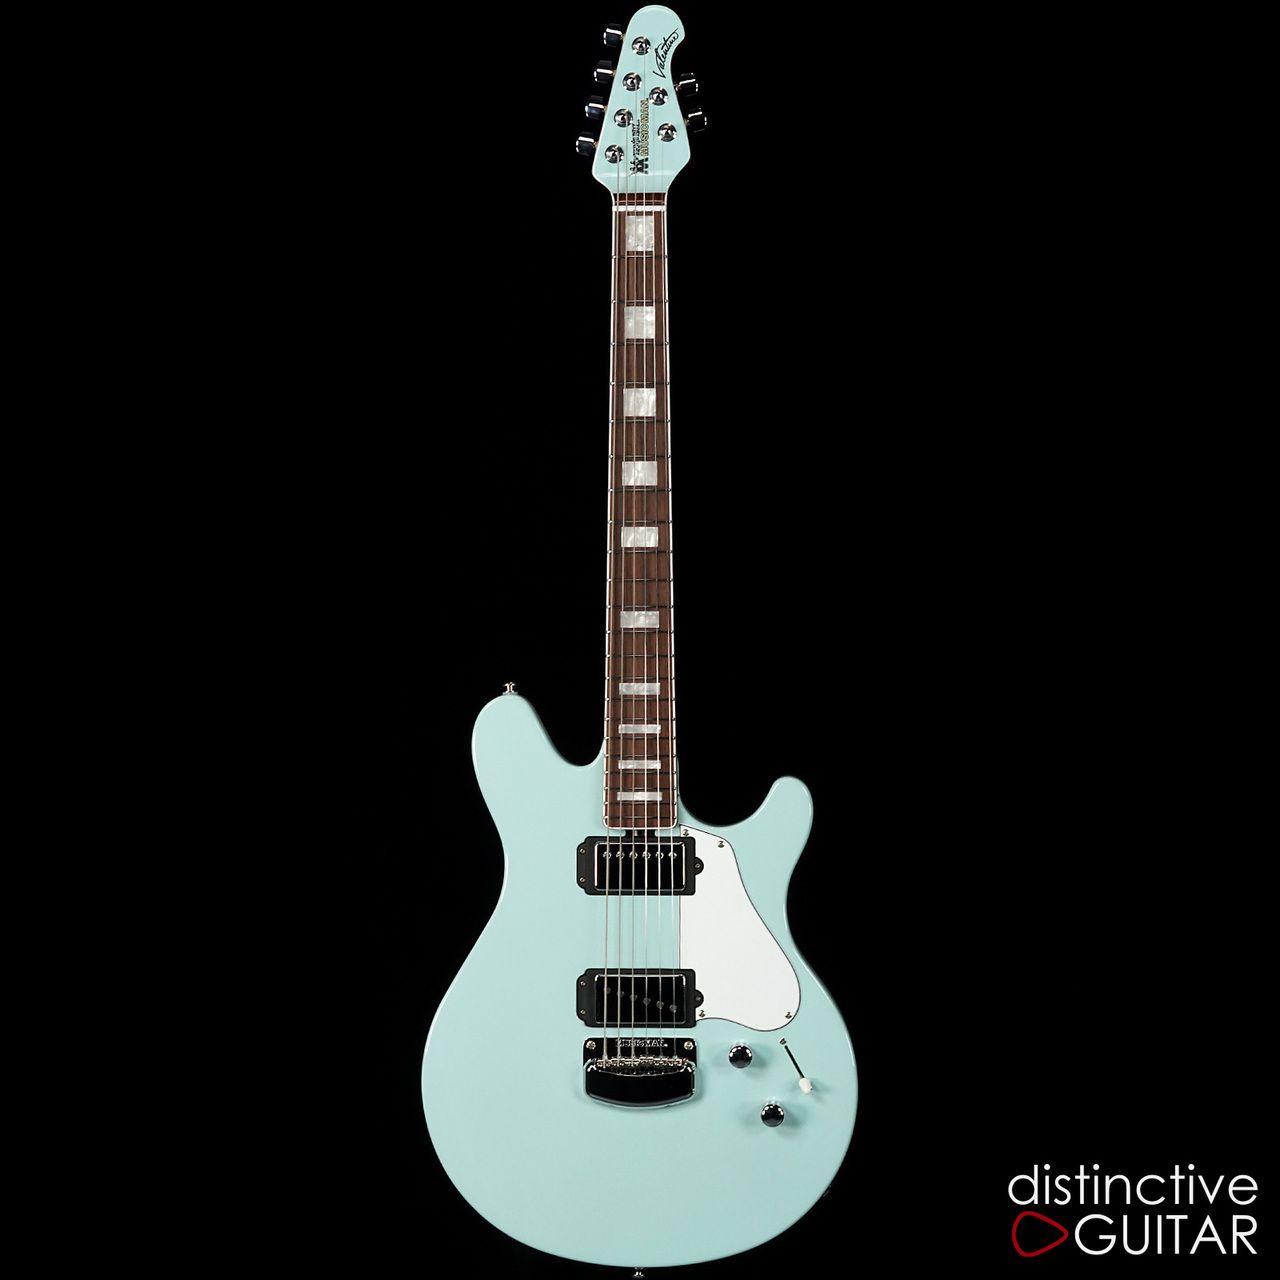 ernie ball music man valentine bfr 23 68 baby blue in 2019 guitars guitar pics music. Black Bedroom Furniture Sets. Home Design Ideas